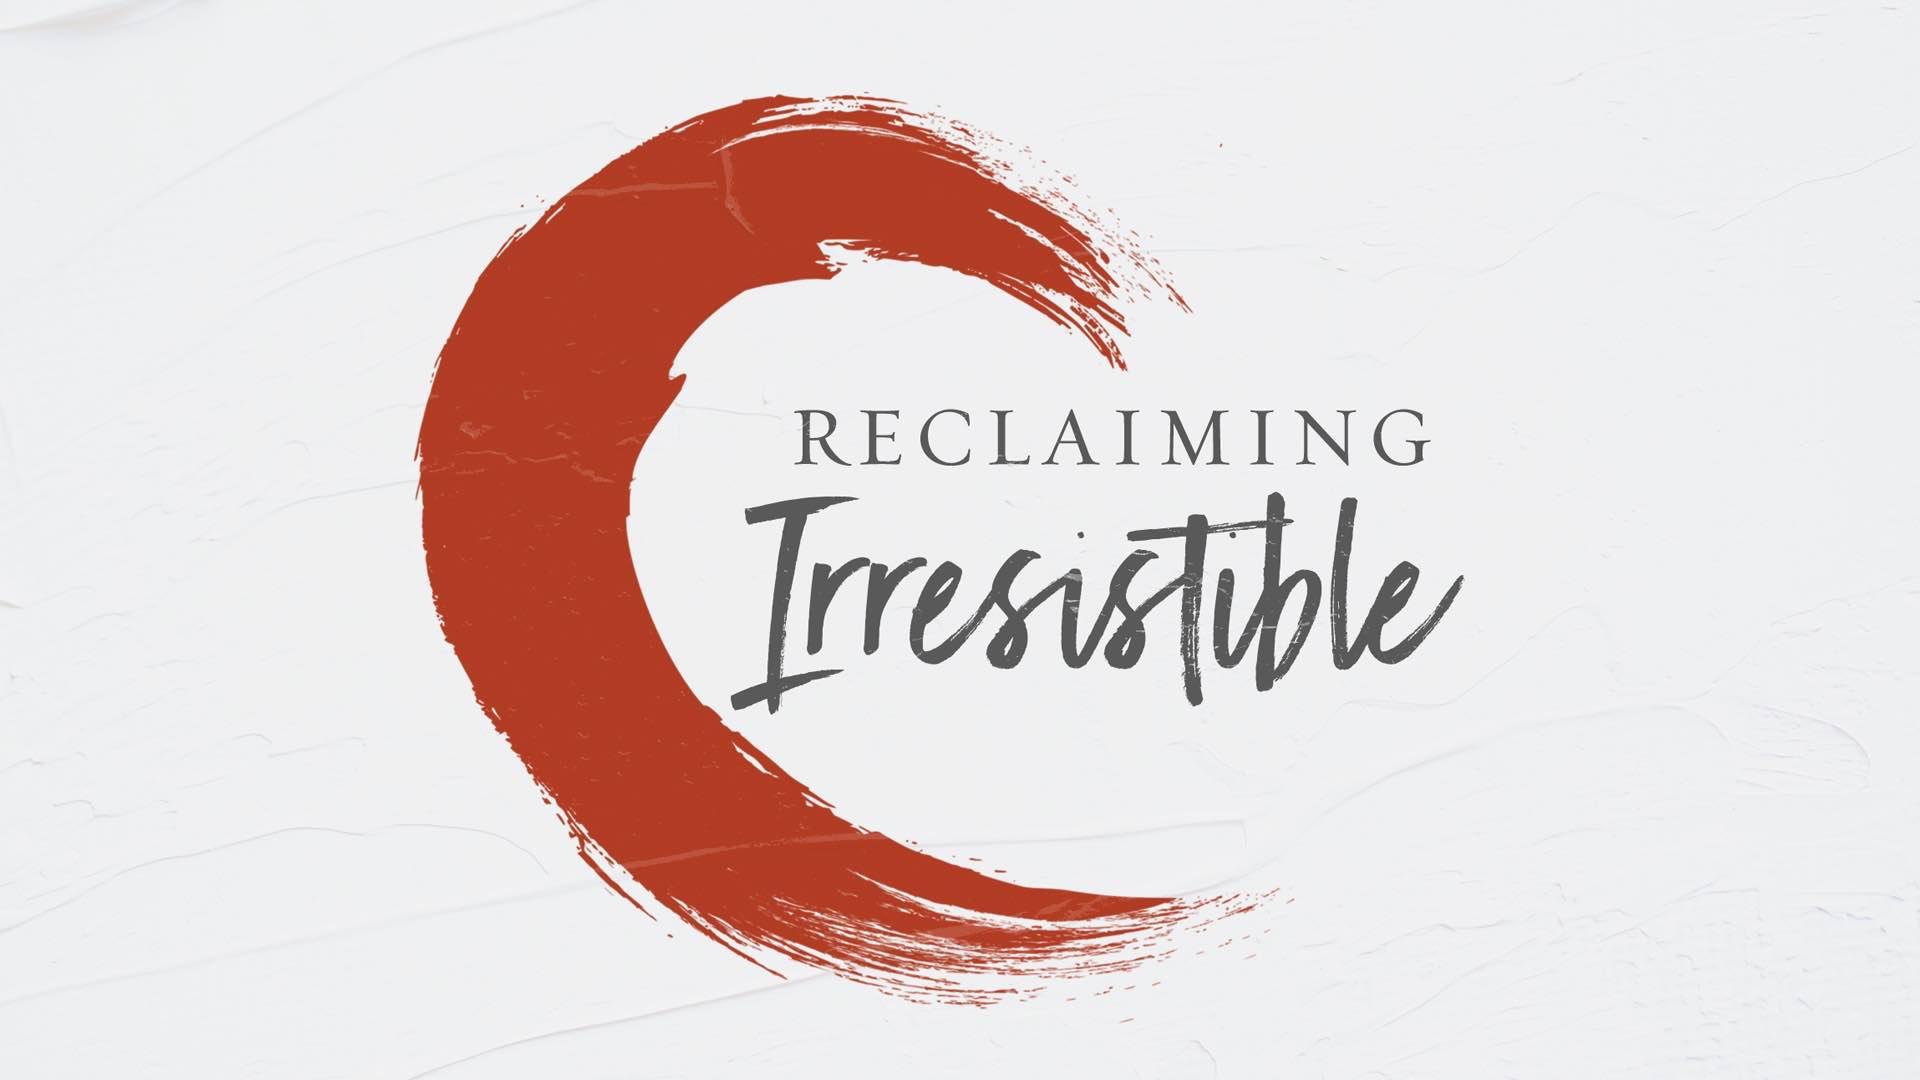 Reclaiming Irresistible